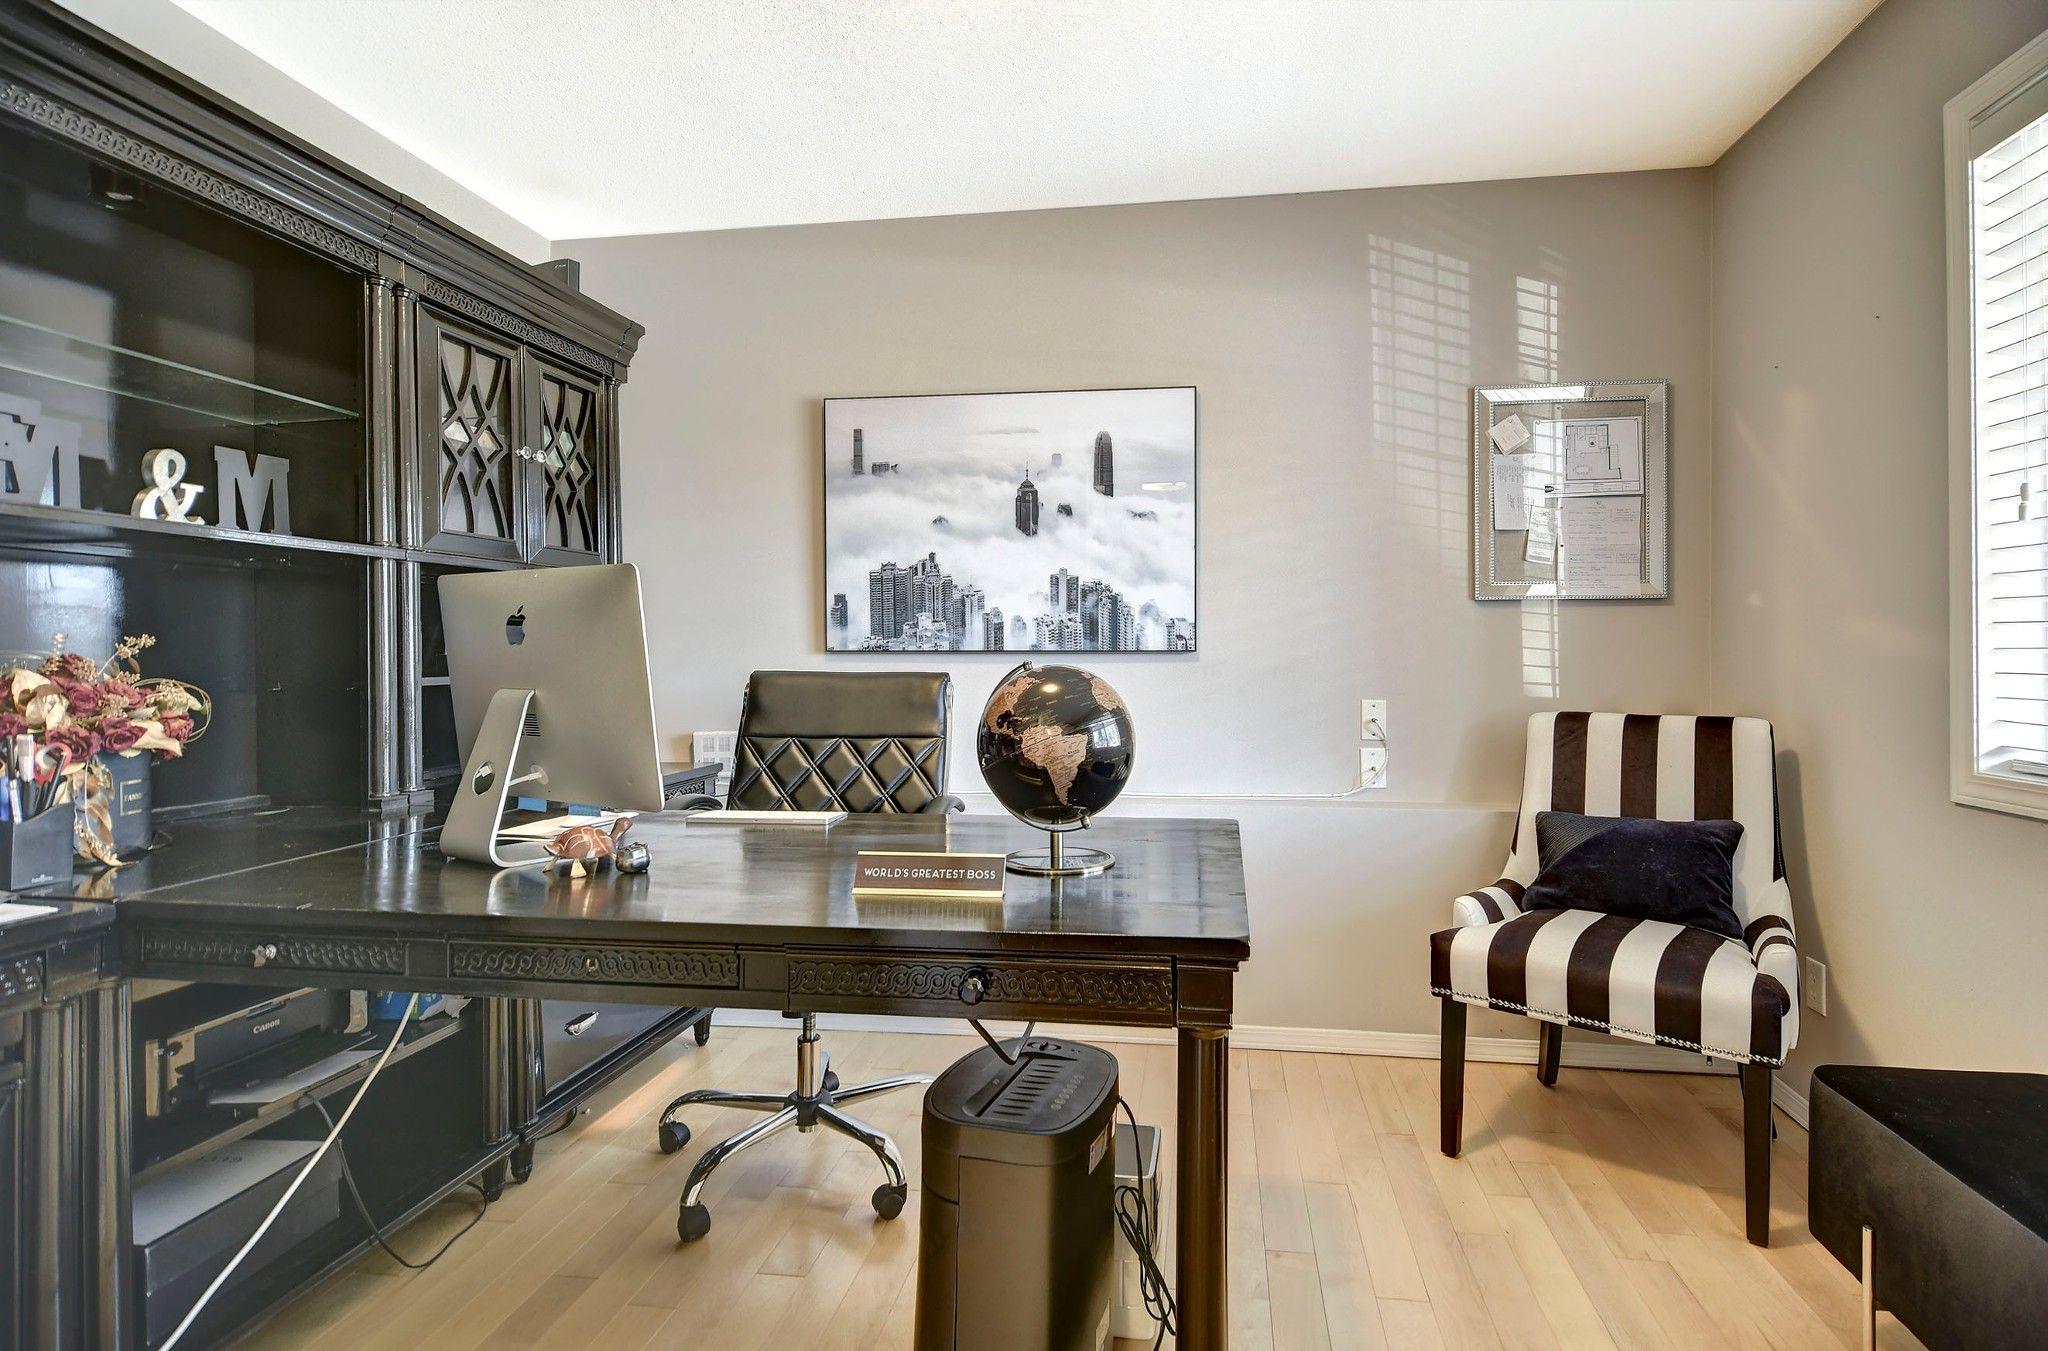 Photo 13: Photos: 270 Magic Drive in Kelowna: House for sale : MLS®# 10200191